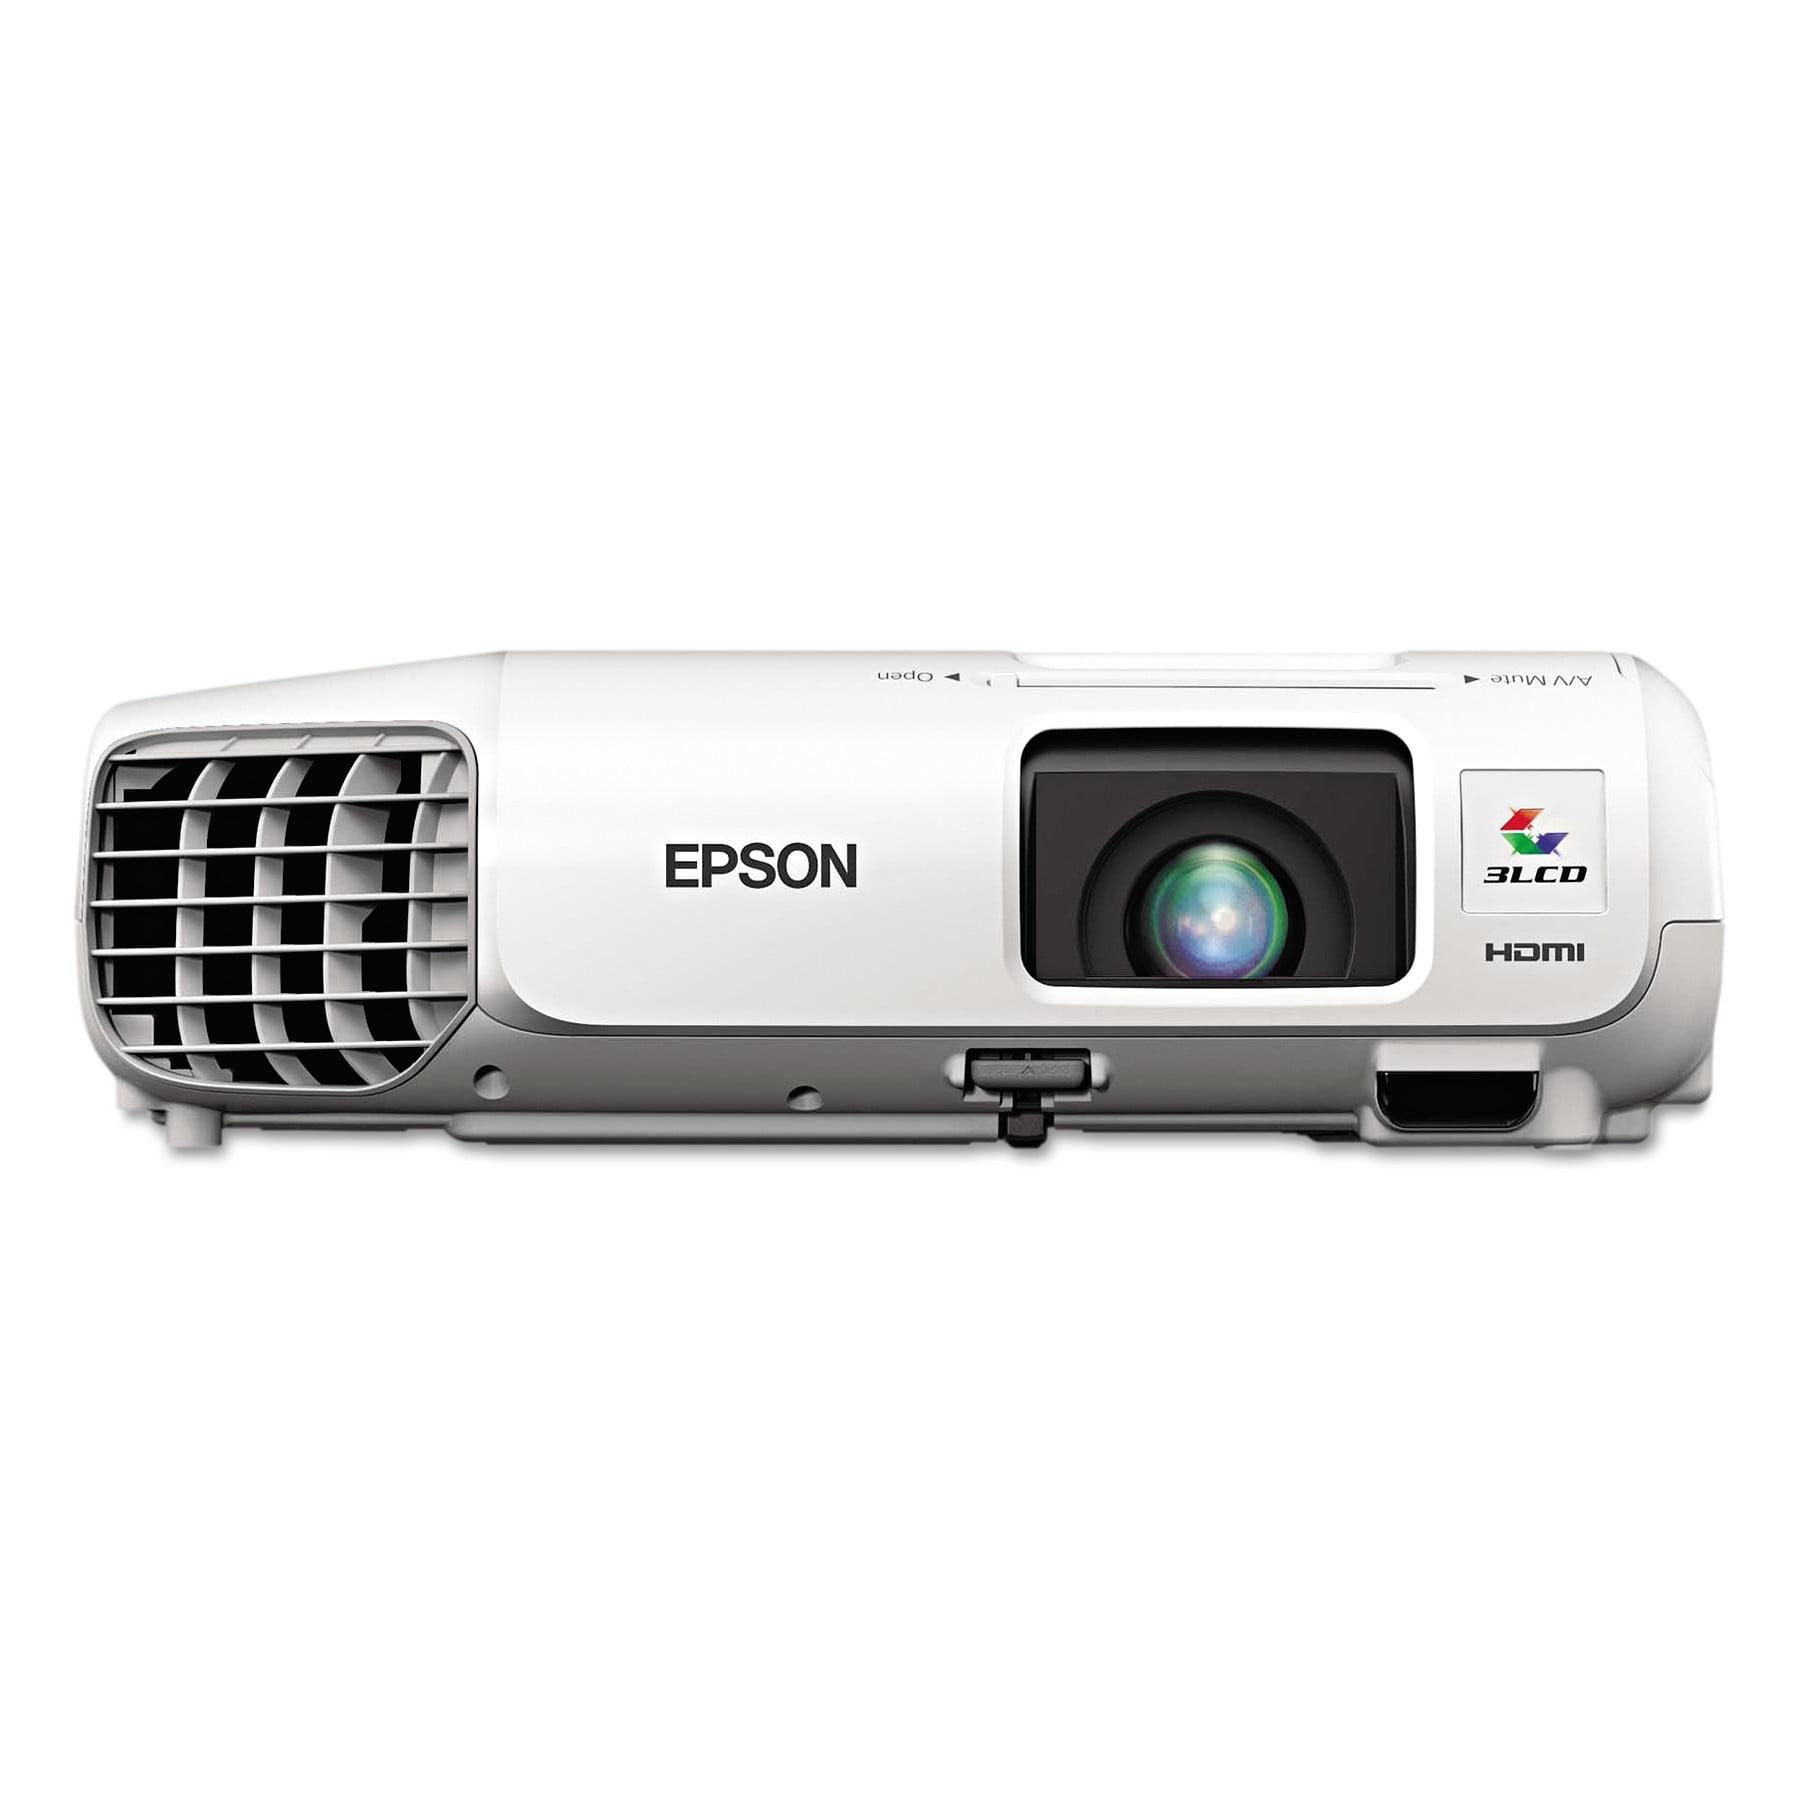 Epson PowerLite X27 XGA 3LCD Projector, 2700 Lumens, 1024 x 768 Pixels, 1.2x Zoom by EPSON AMERICA, INC.